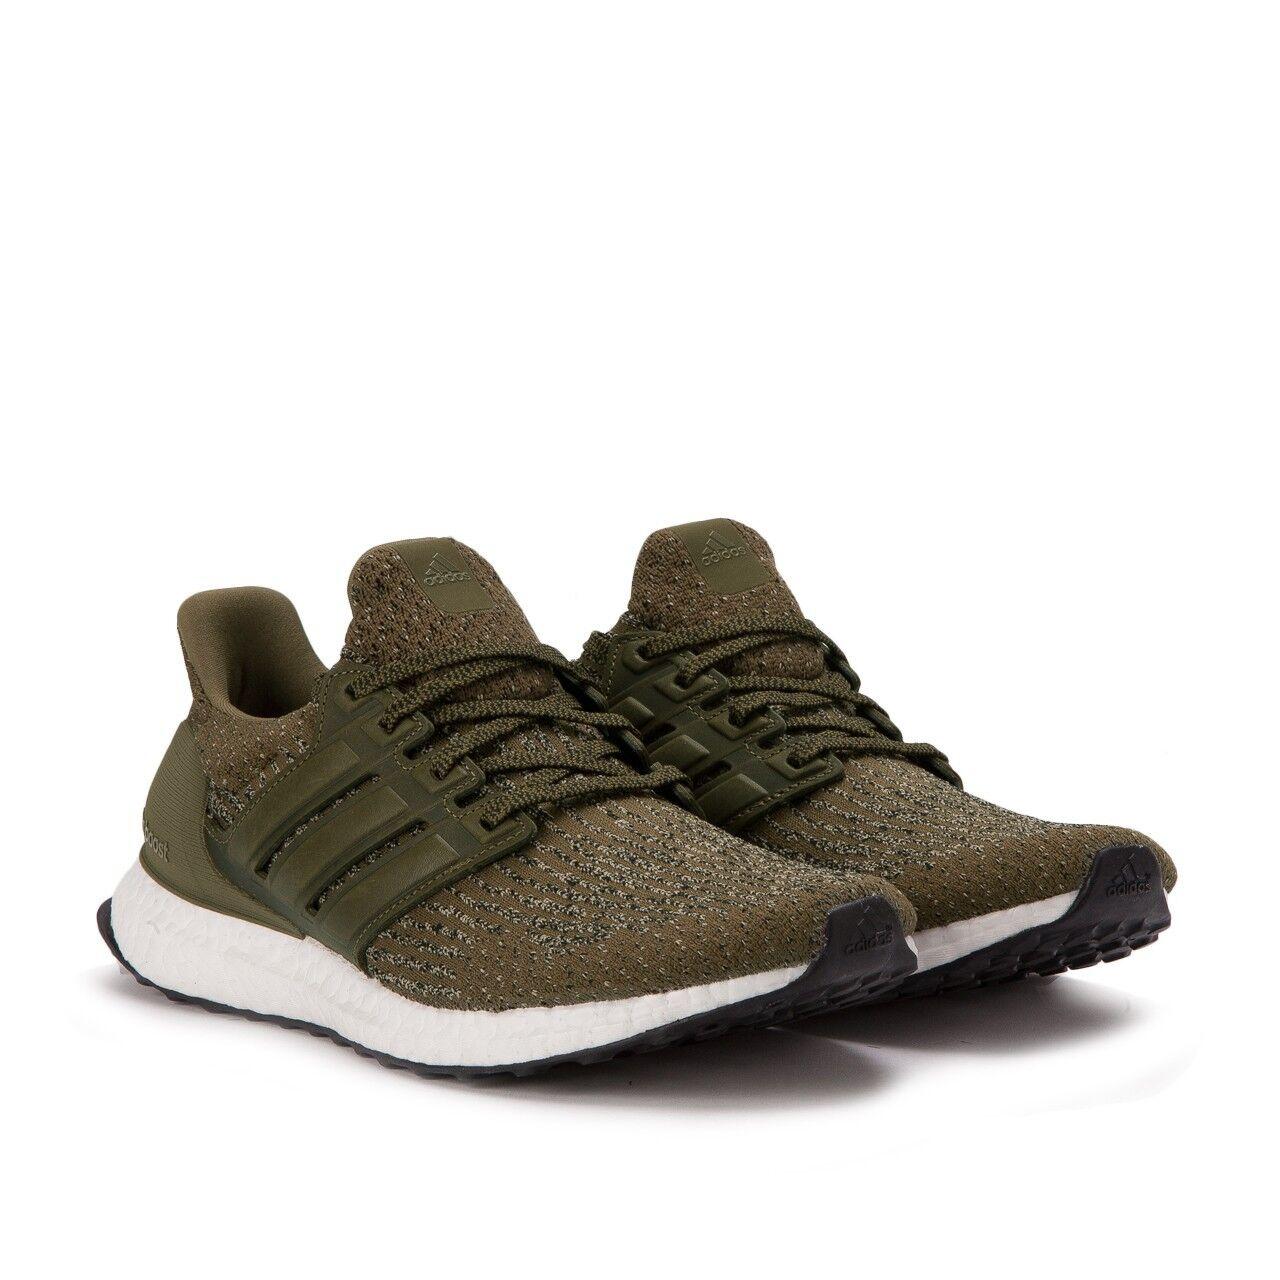 Adidas ultra nmd impulso 3,0 traccia olive taglia 10.s82018 yeezy nmd ultra pk ddab8d